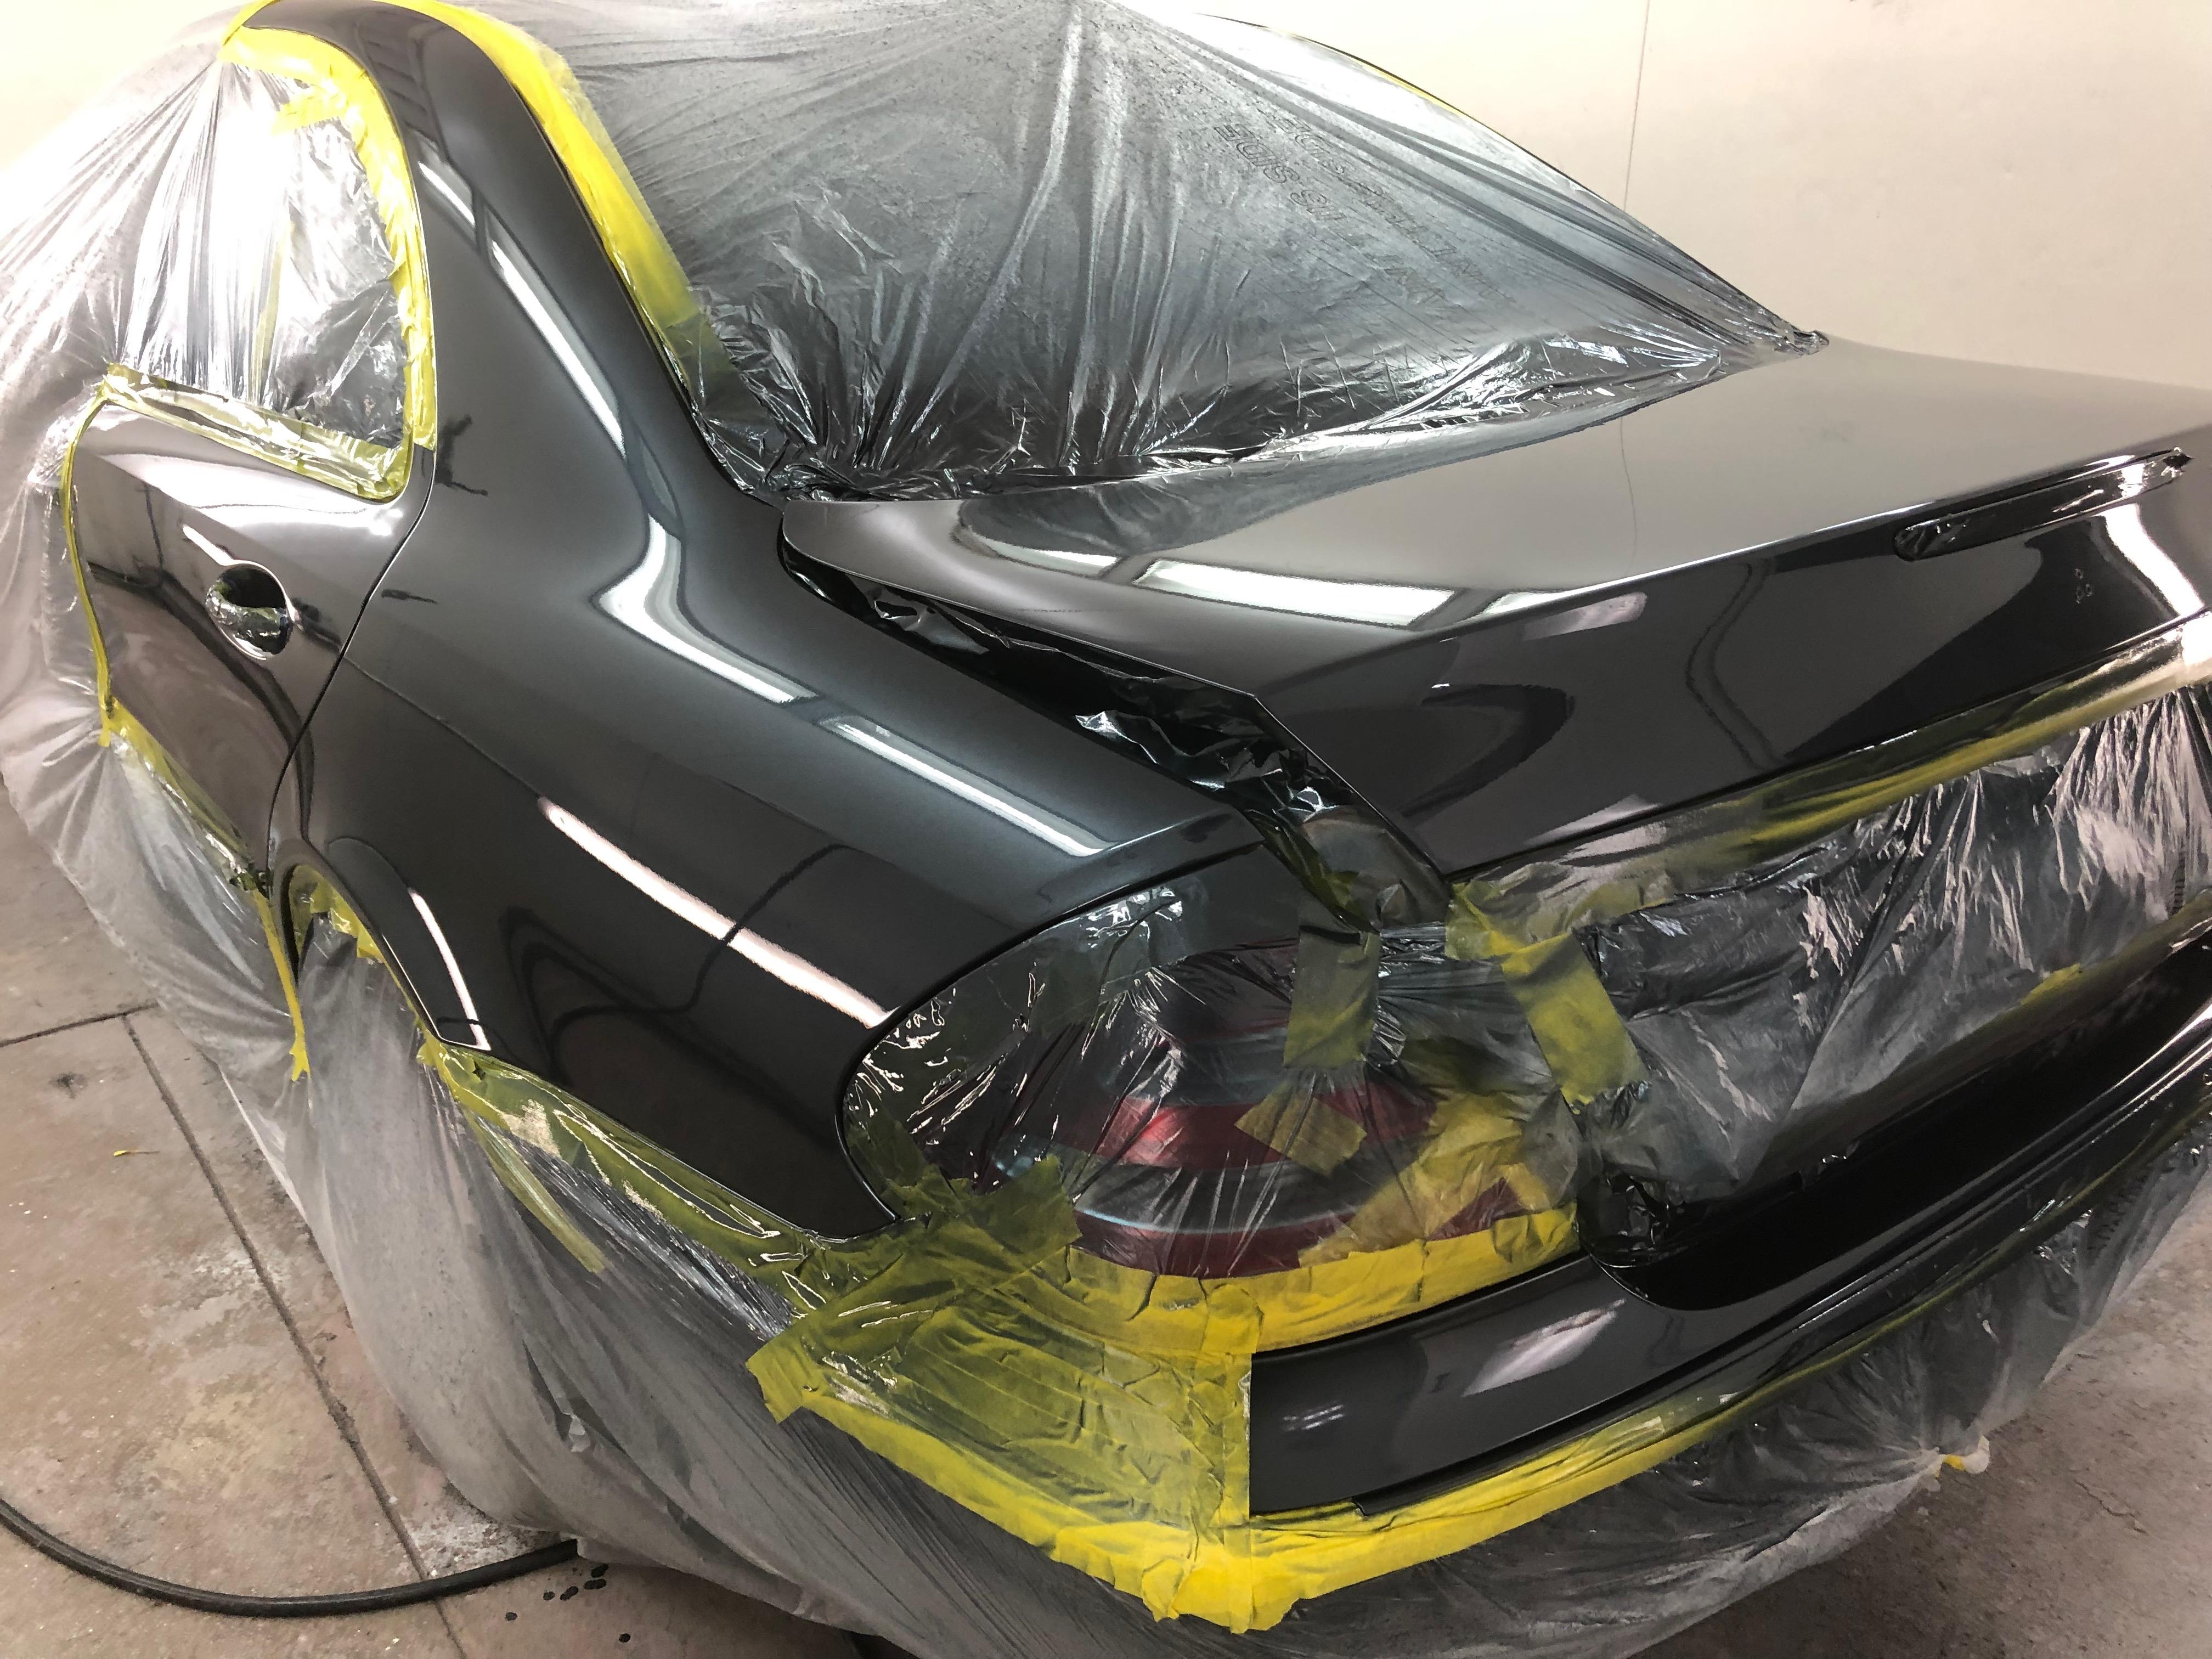 Eurocar Crash Repairs Photos